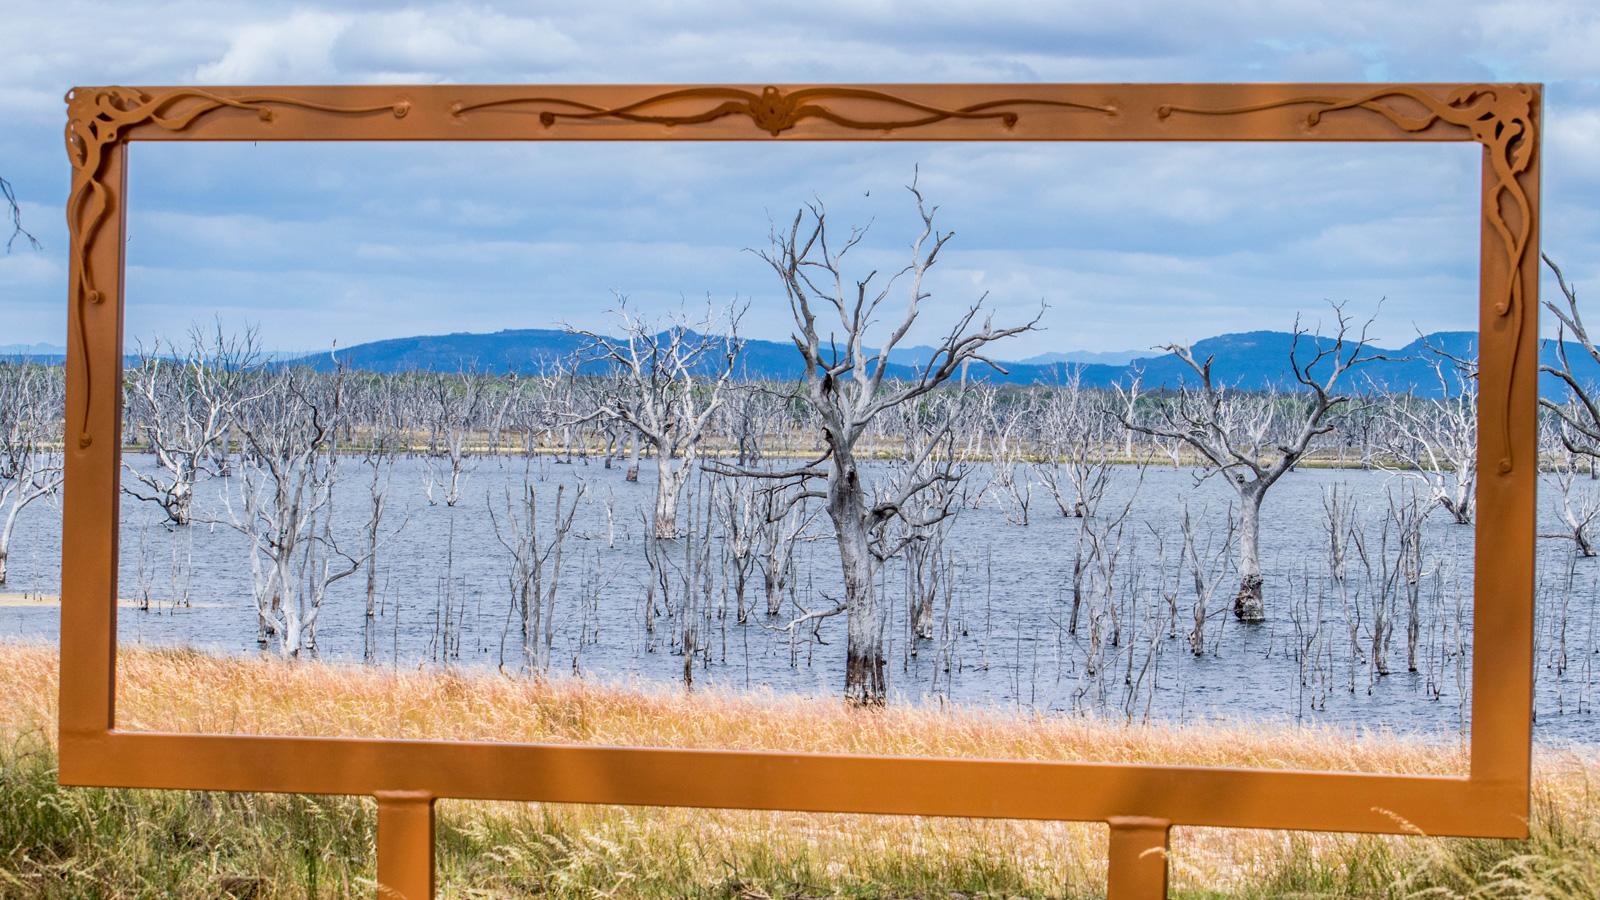 Toolondo Reservoir, Framing the Wimmera, Grampians, Victoria, Australia